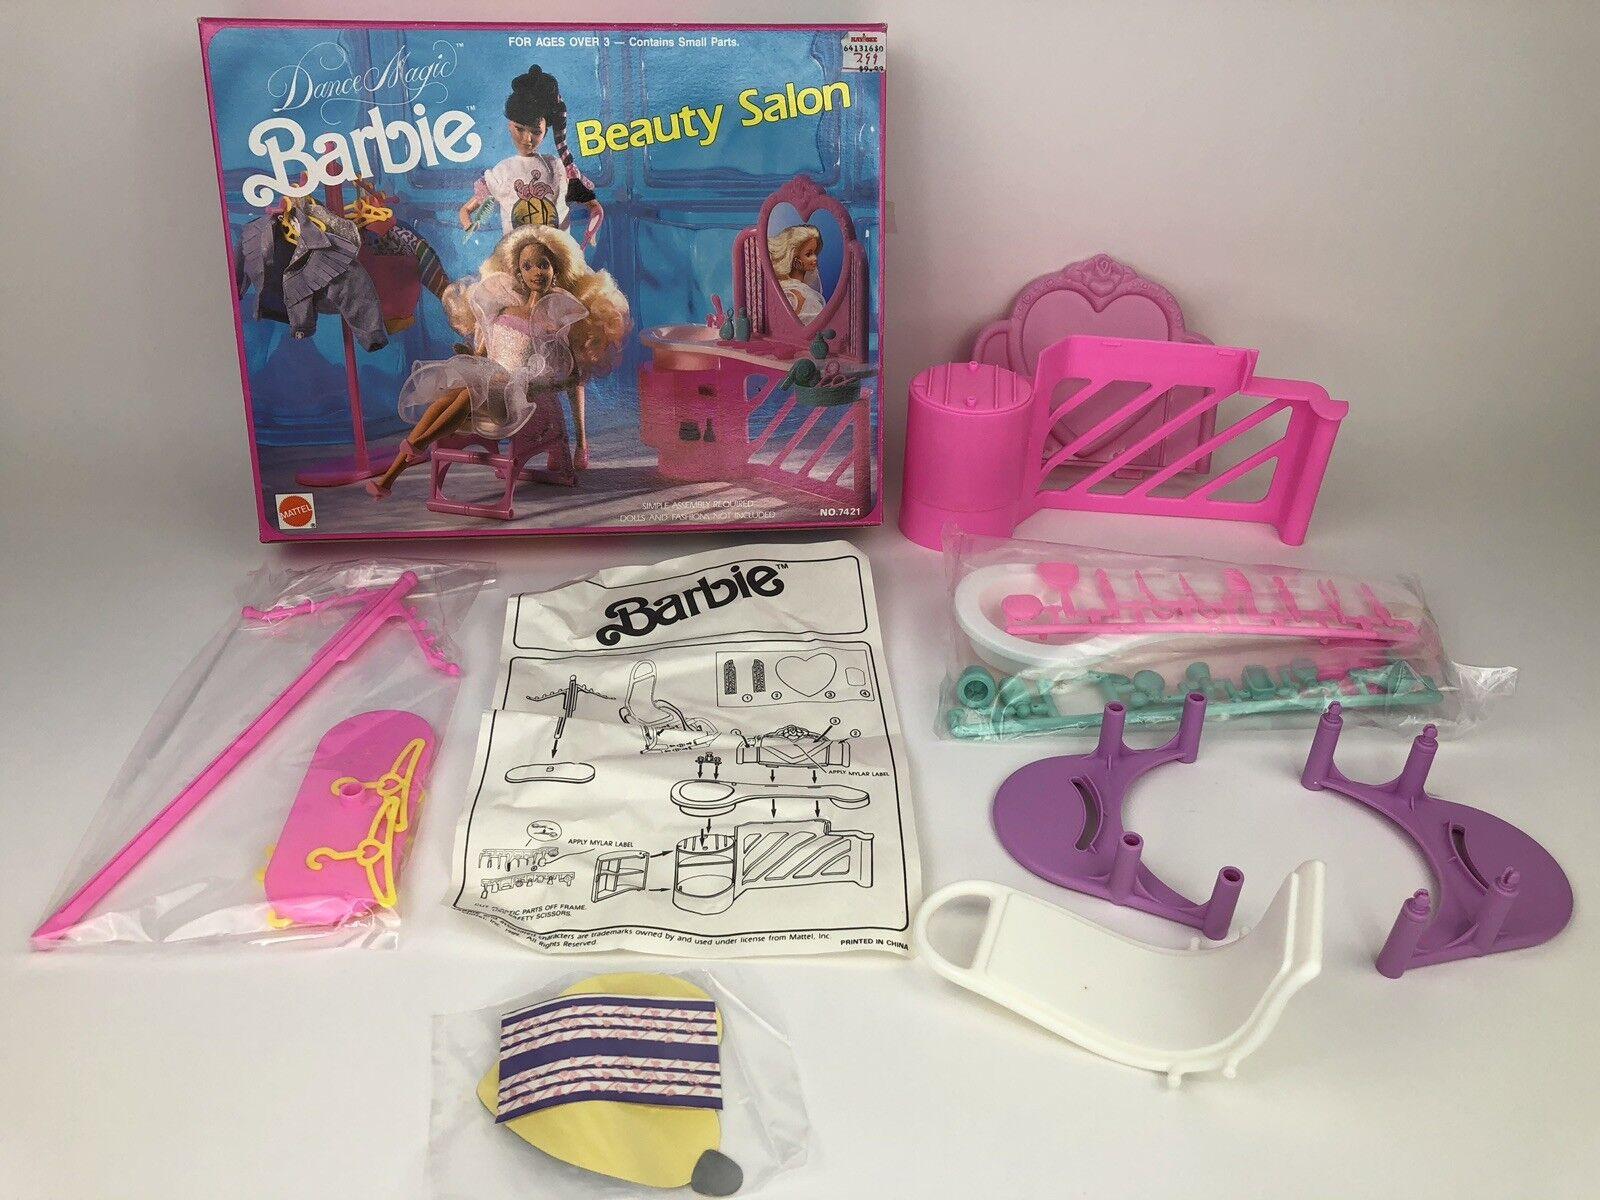 Nuevo 1991 Dance Magic Barbie Salón De Belleza